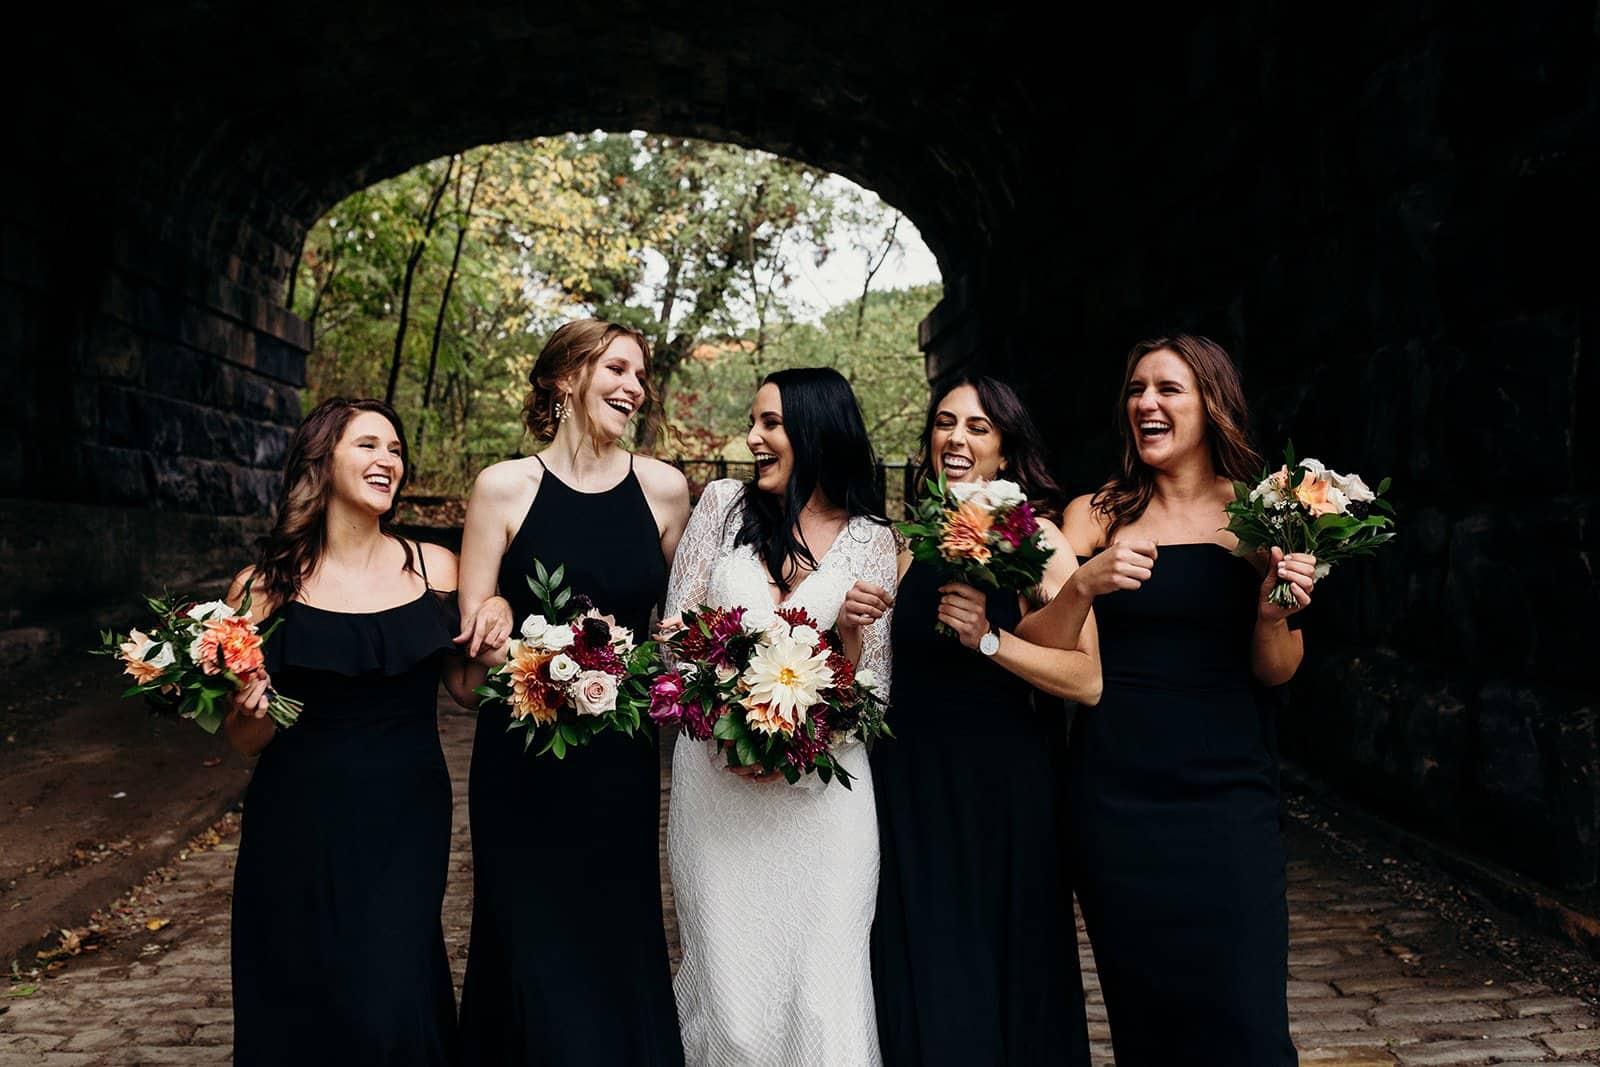 bridesmaids pose during formals